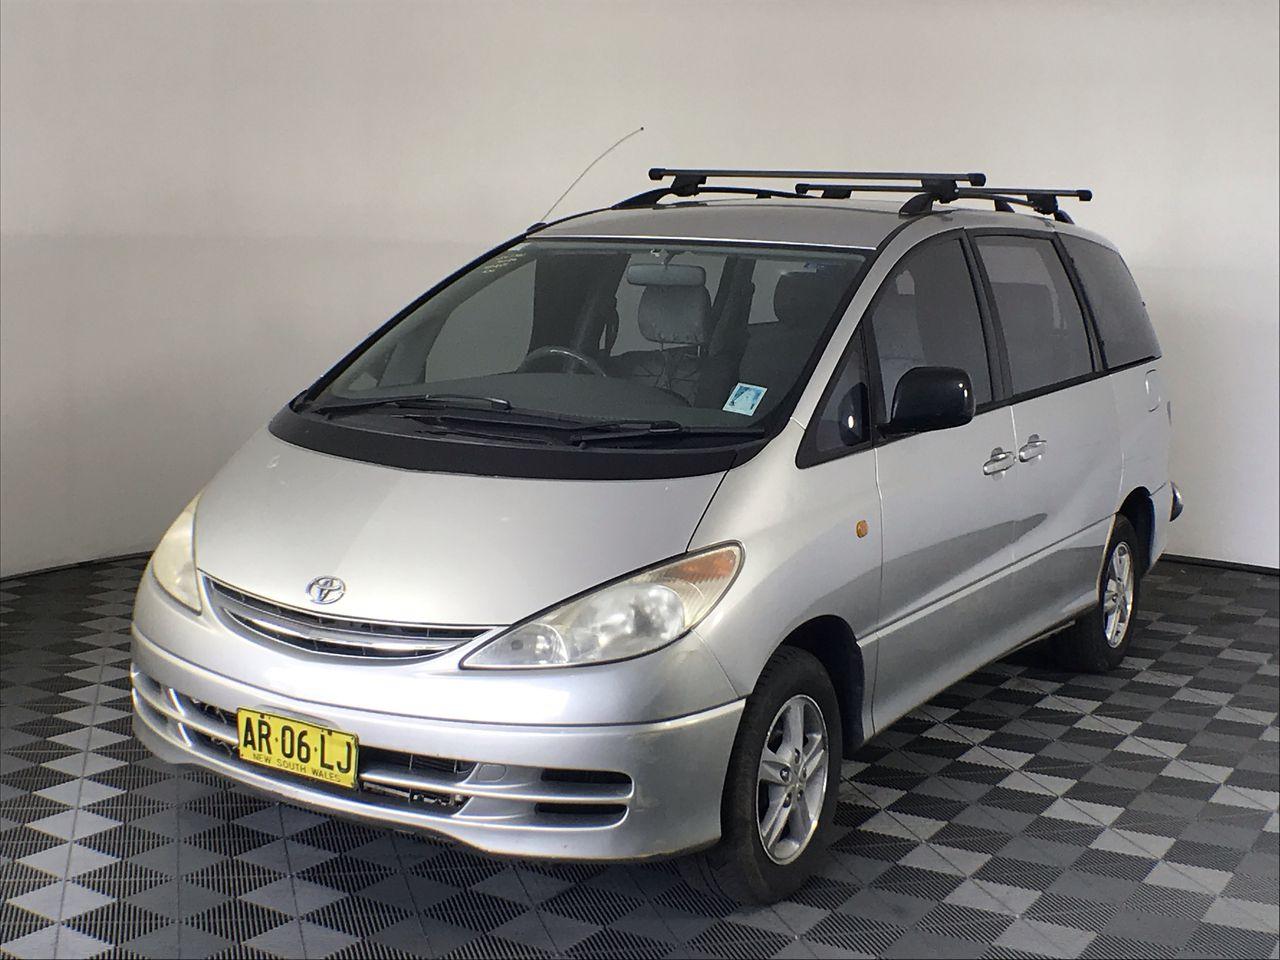 2001 Toyota Tarago GLX ACR30R Automatic 7 Seats People Mover